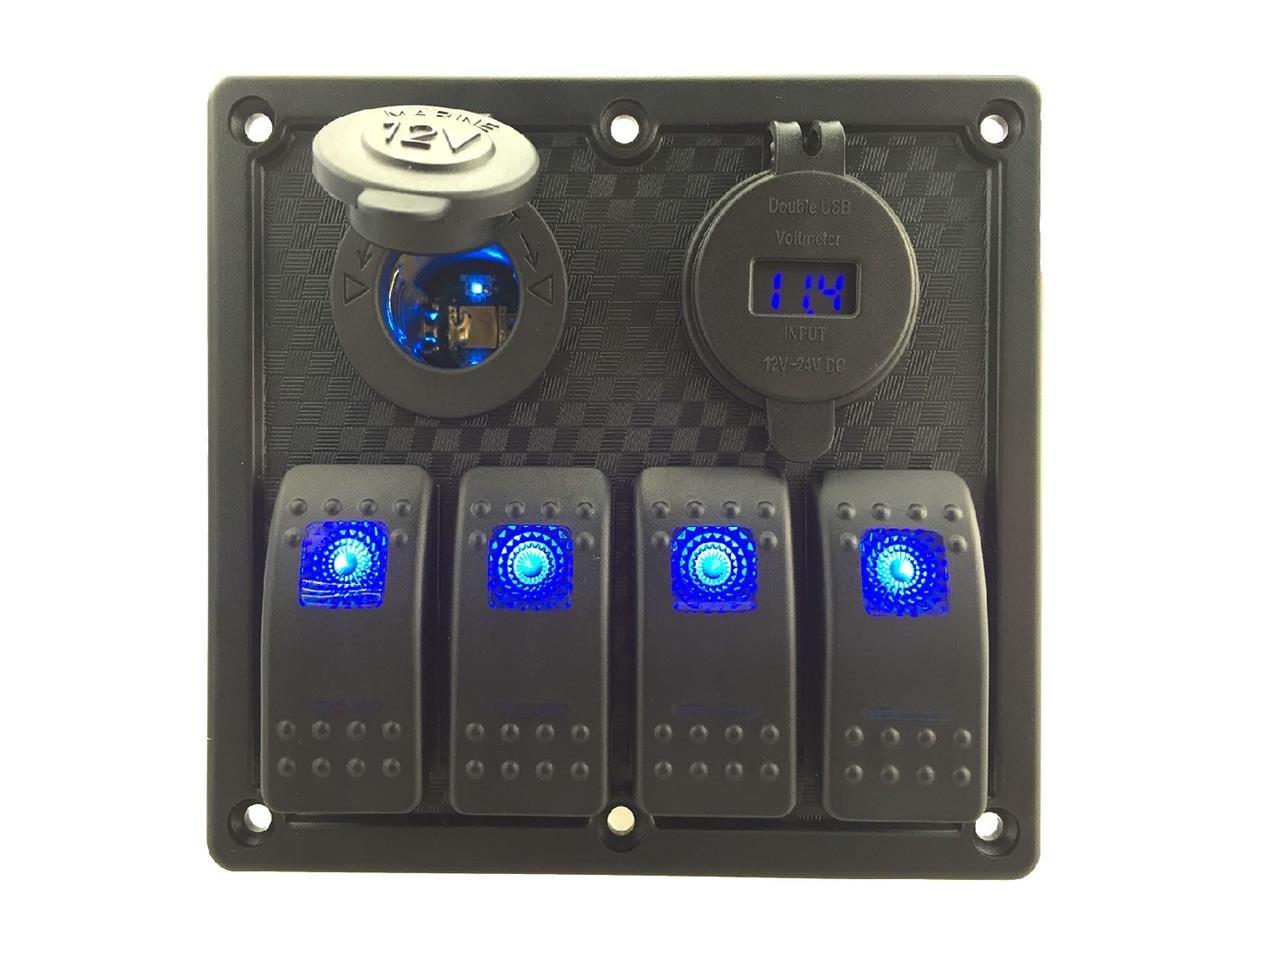 IZTOSS 12V-24V DC 4 gang Waterproof marine blue led switch panel with led power socket and 4.2A USB voltmeter